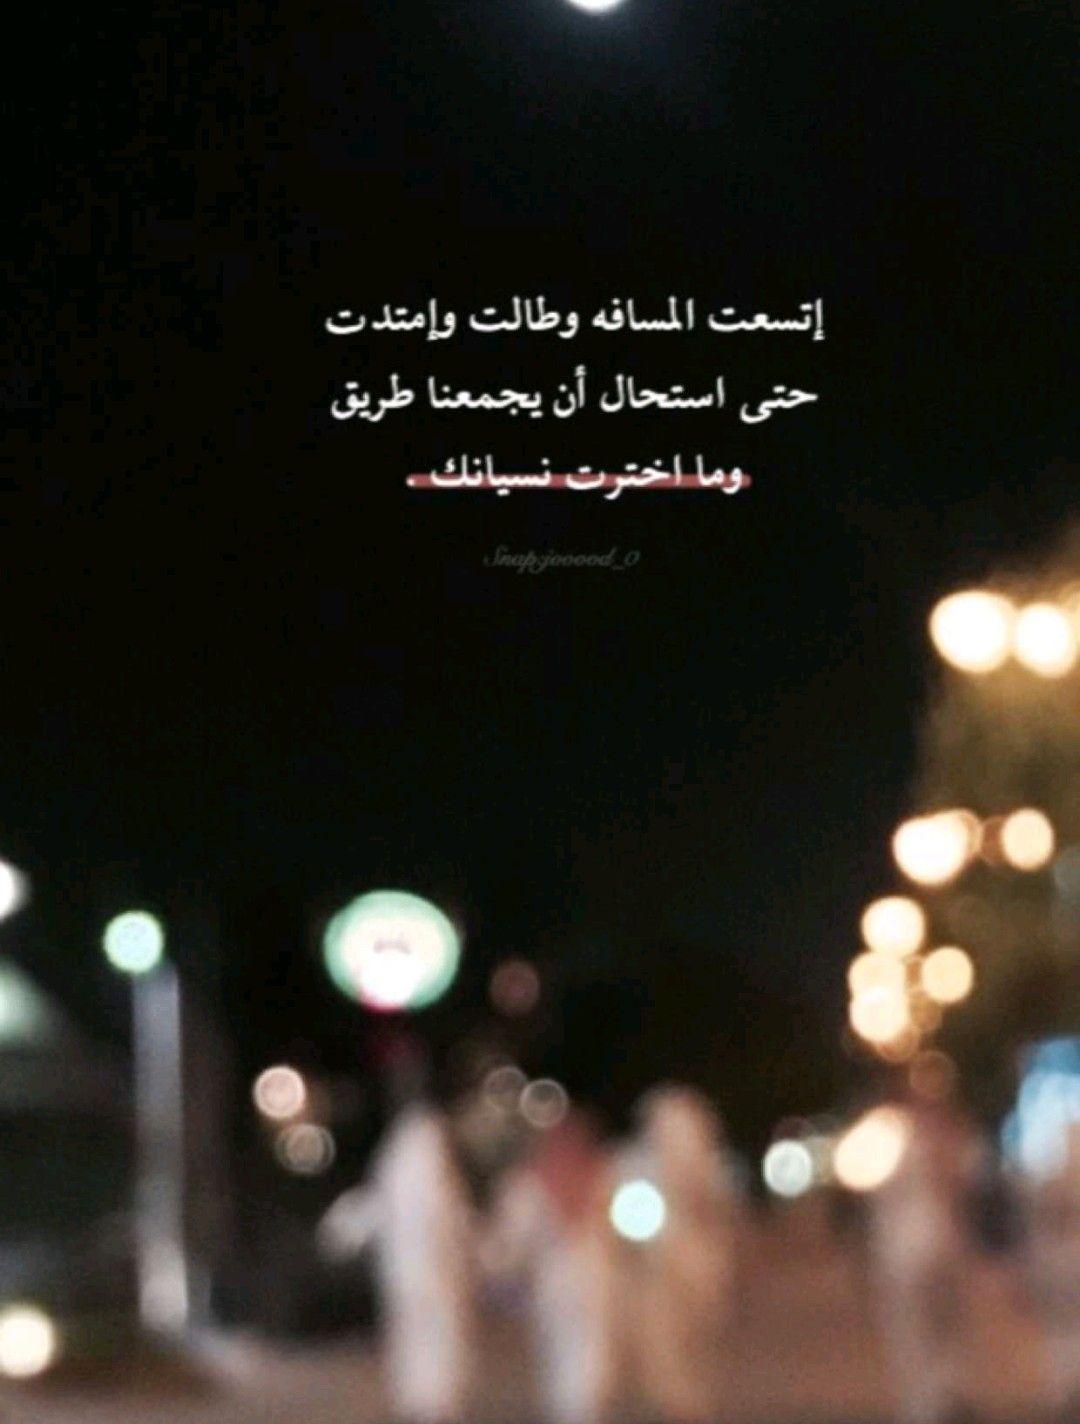 Pin By Masyart On كلمات راقية Morning Quotes Arabic Love Quotes Sweet Words